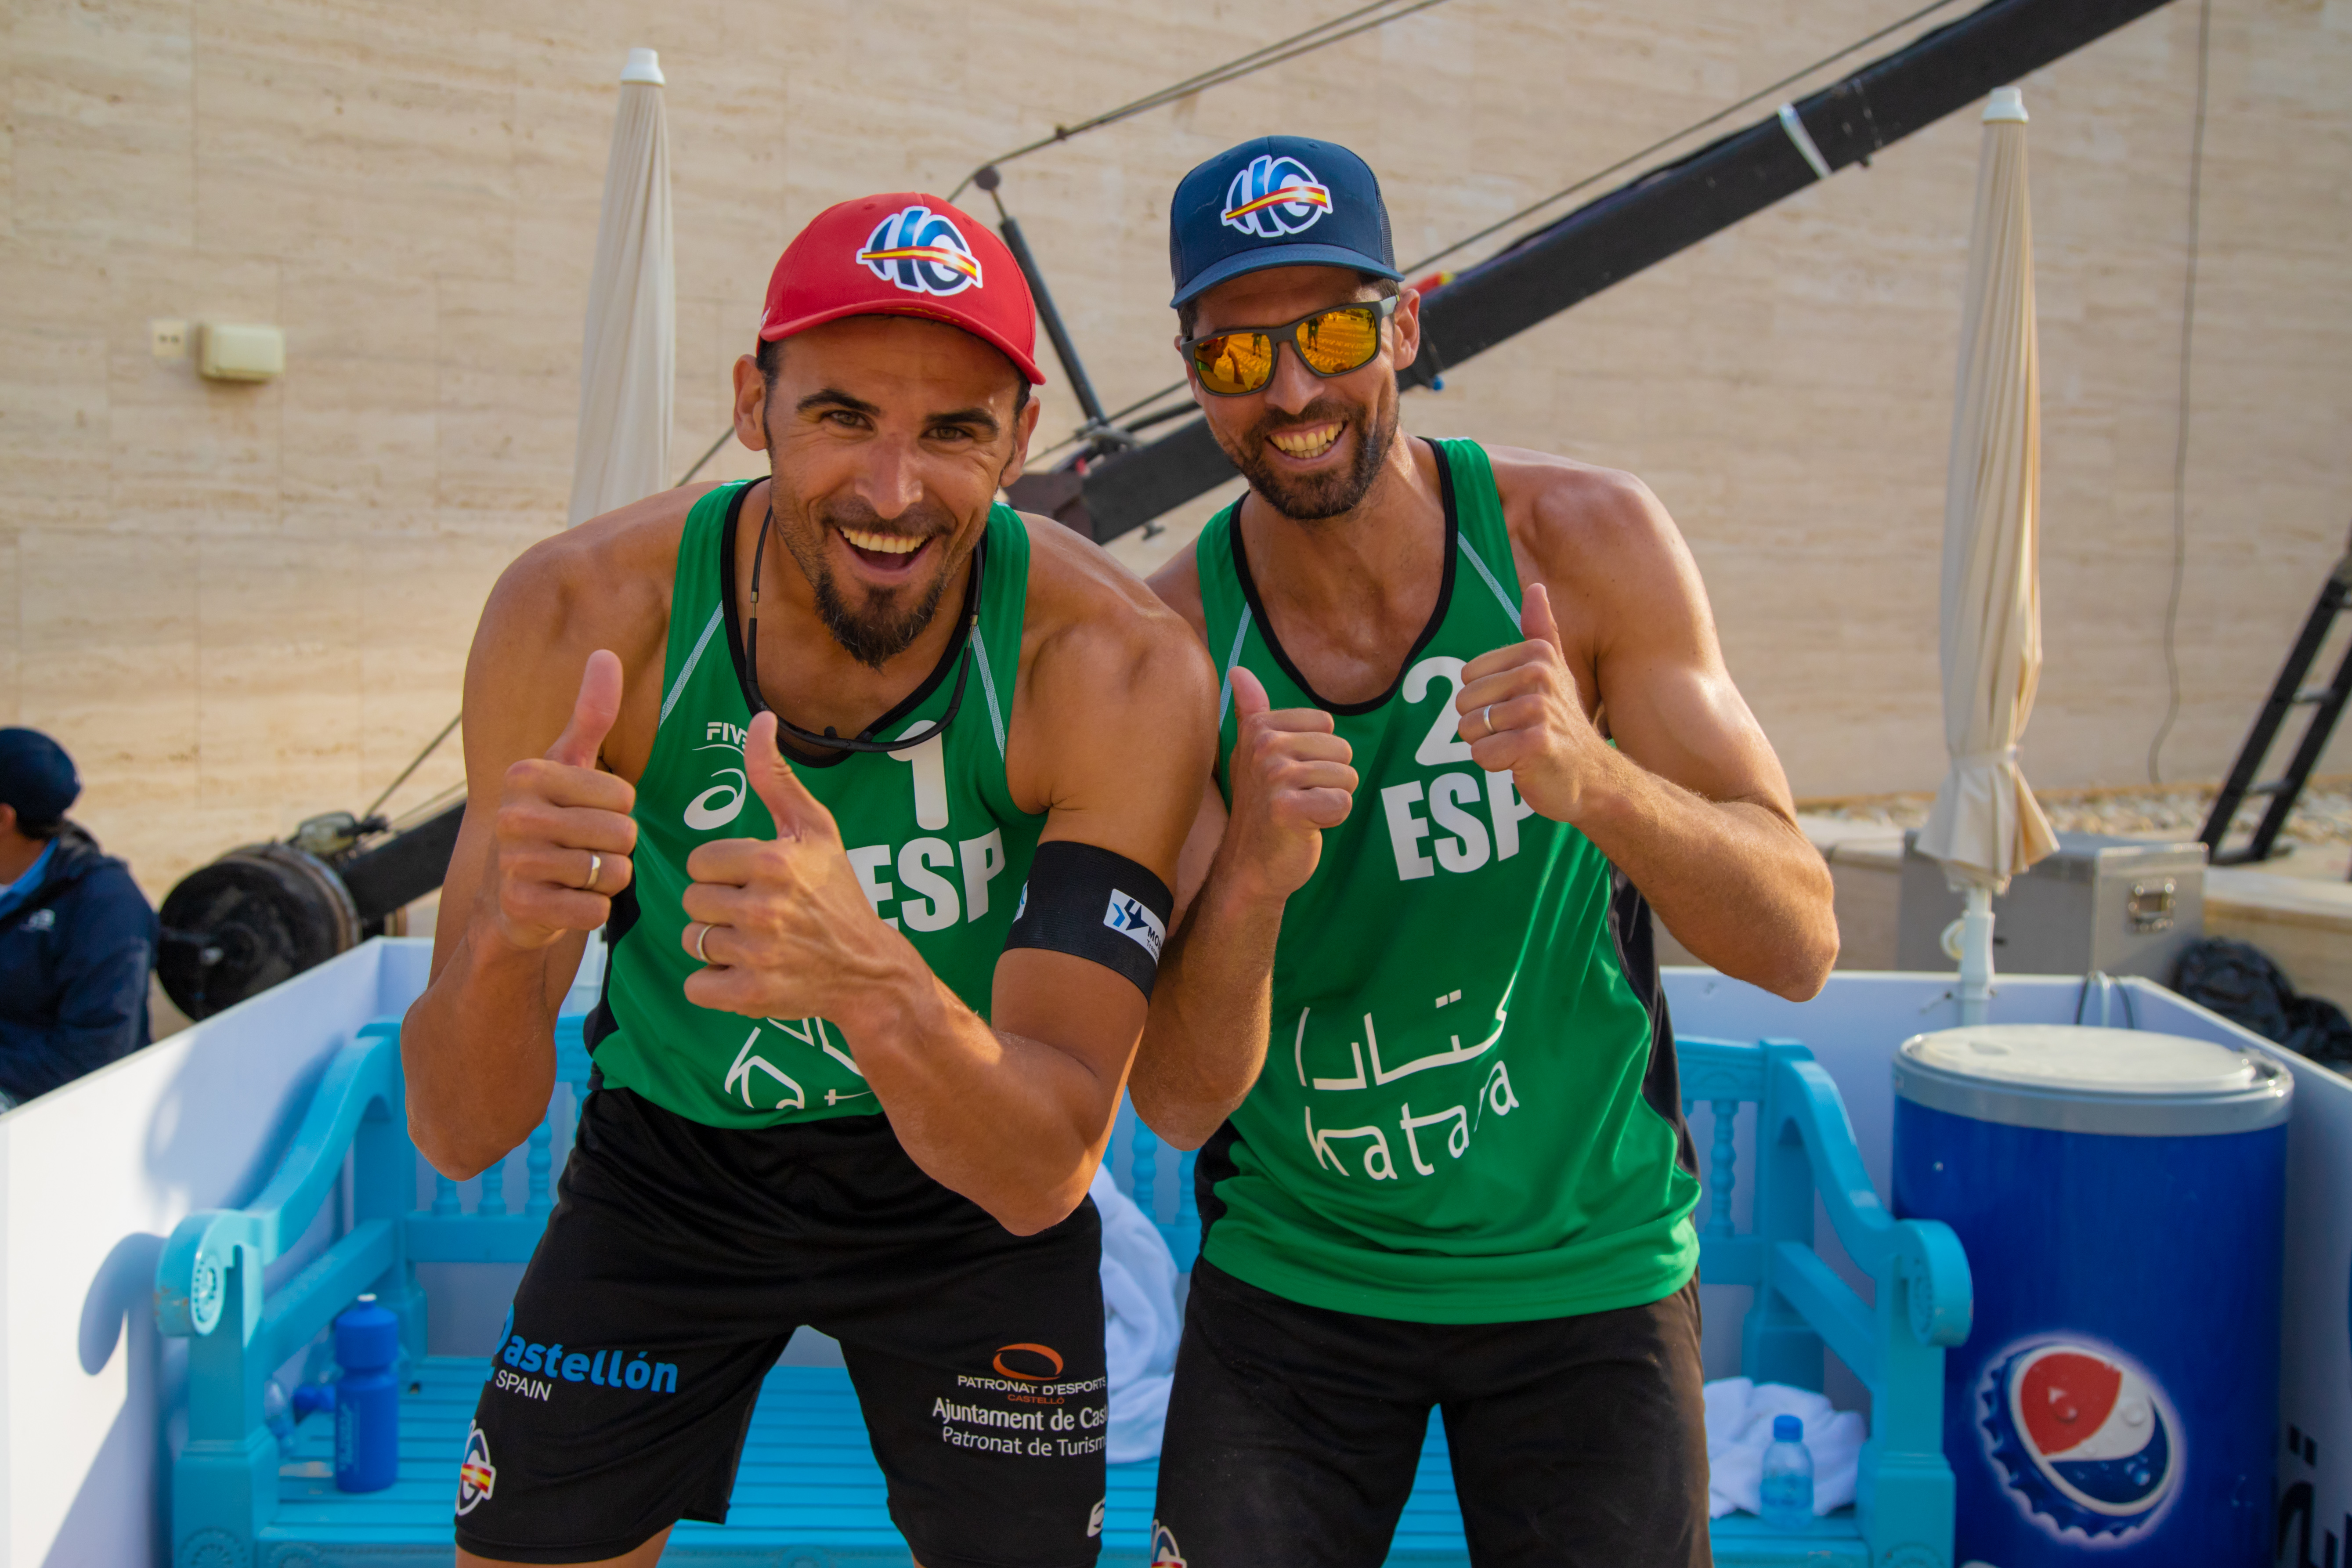 Kantor and Losiak lead way to Doha 4-Star quarterfinals - Doha